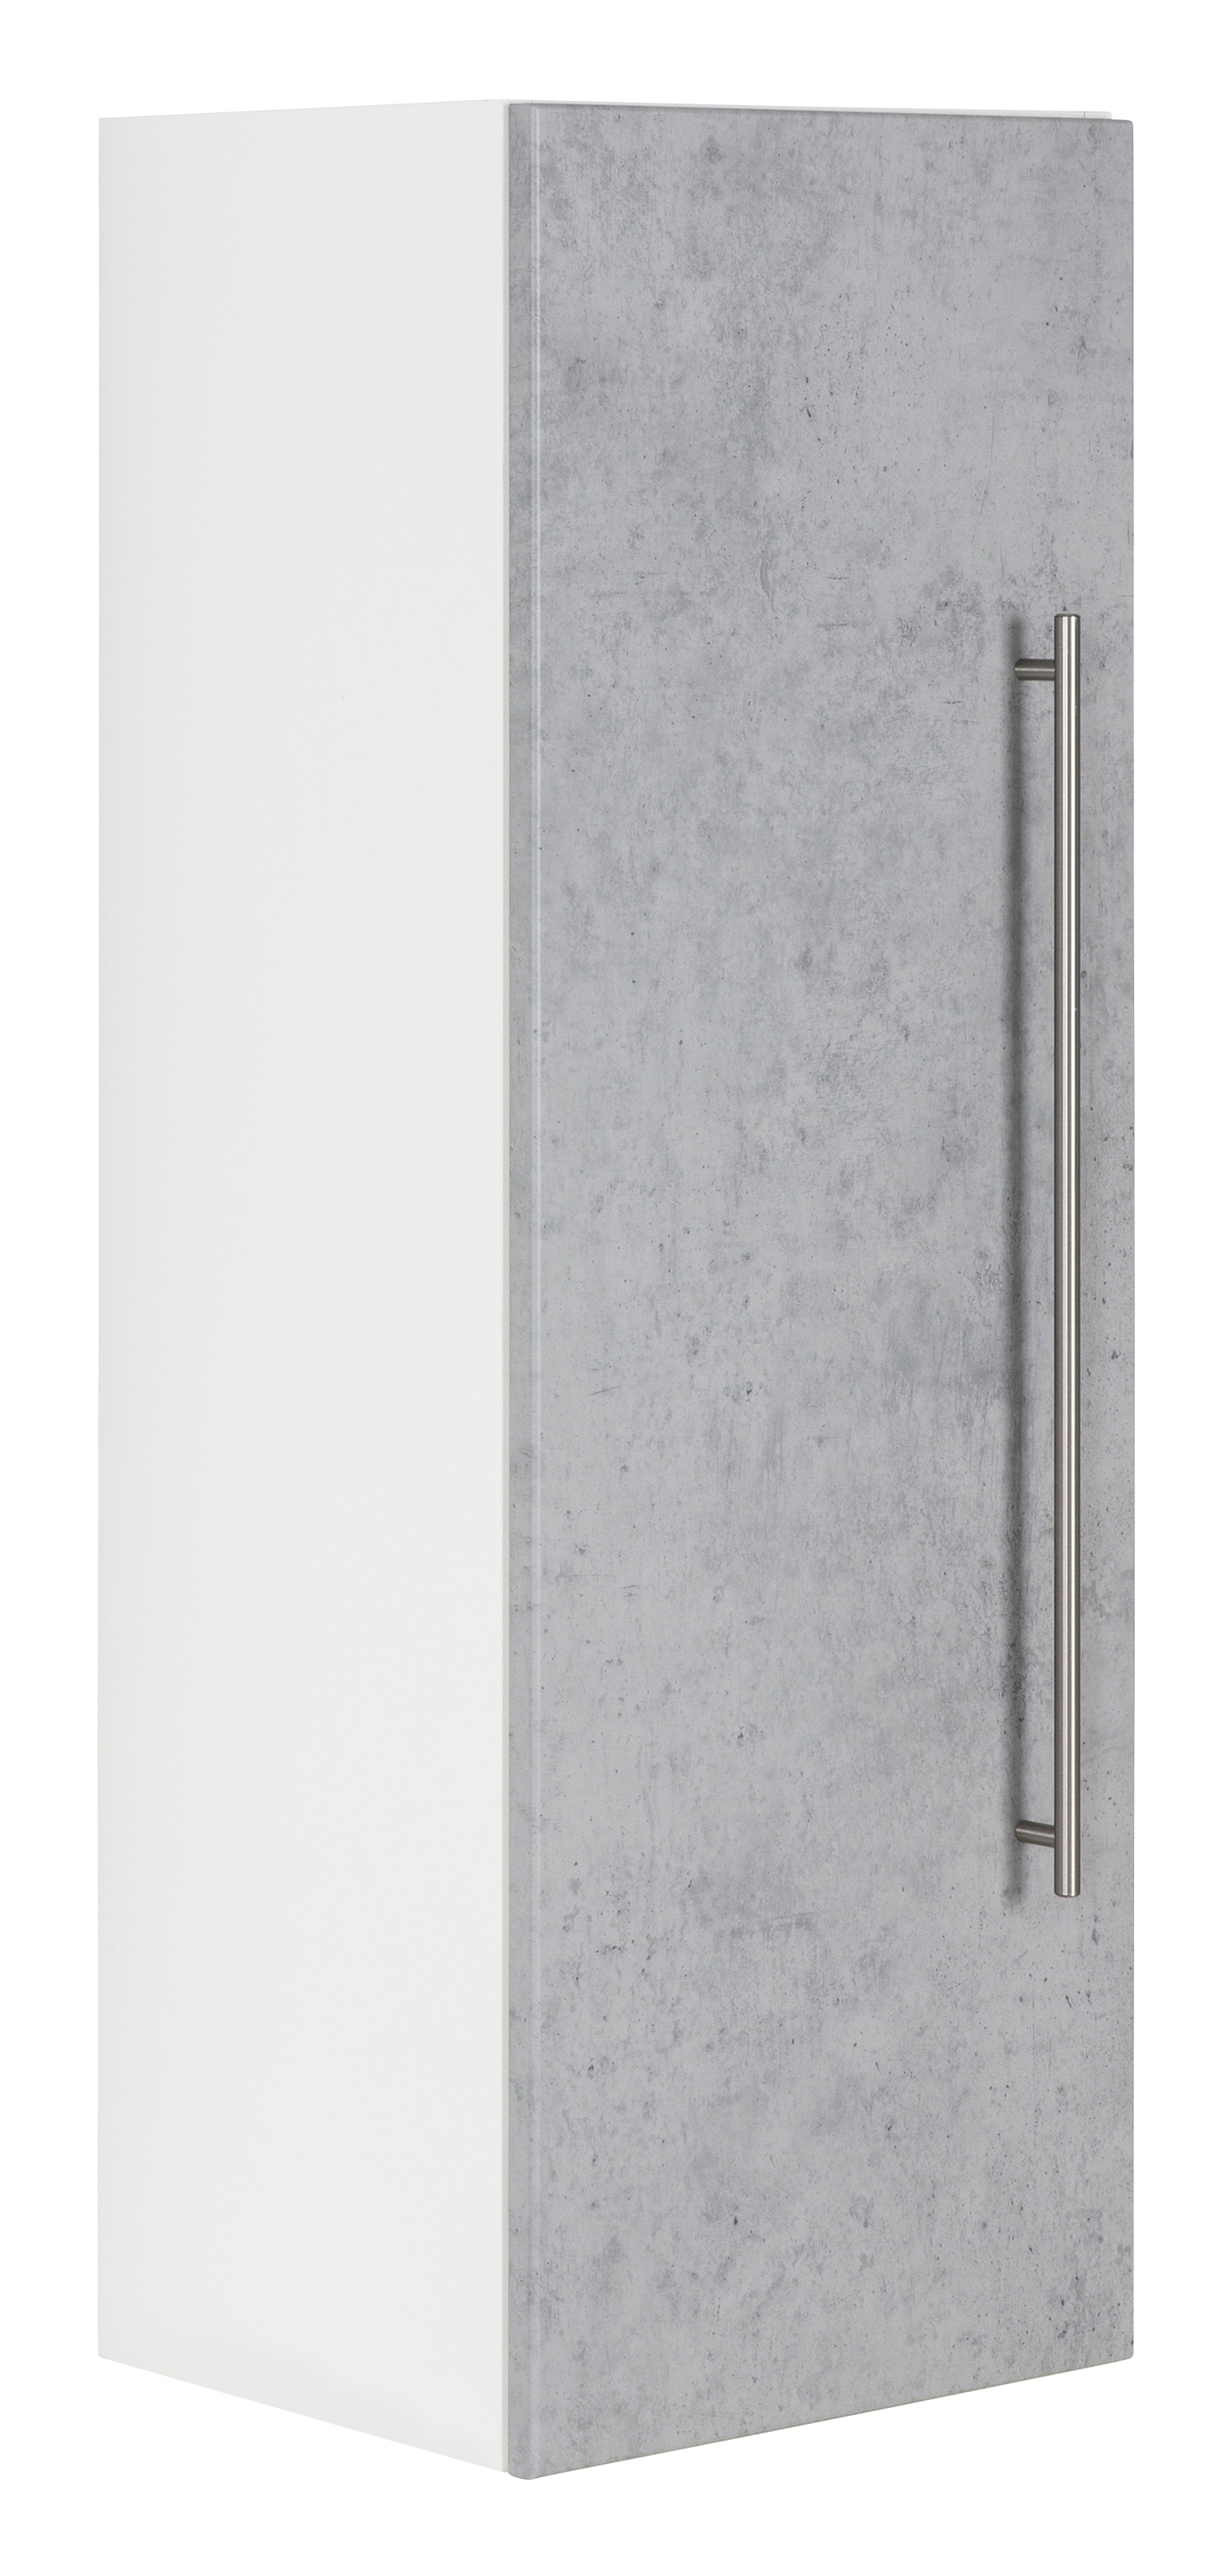 Saniclear Viva kolomkast 100x35x30cm betongrijs